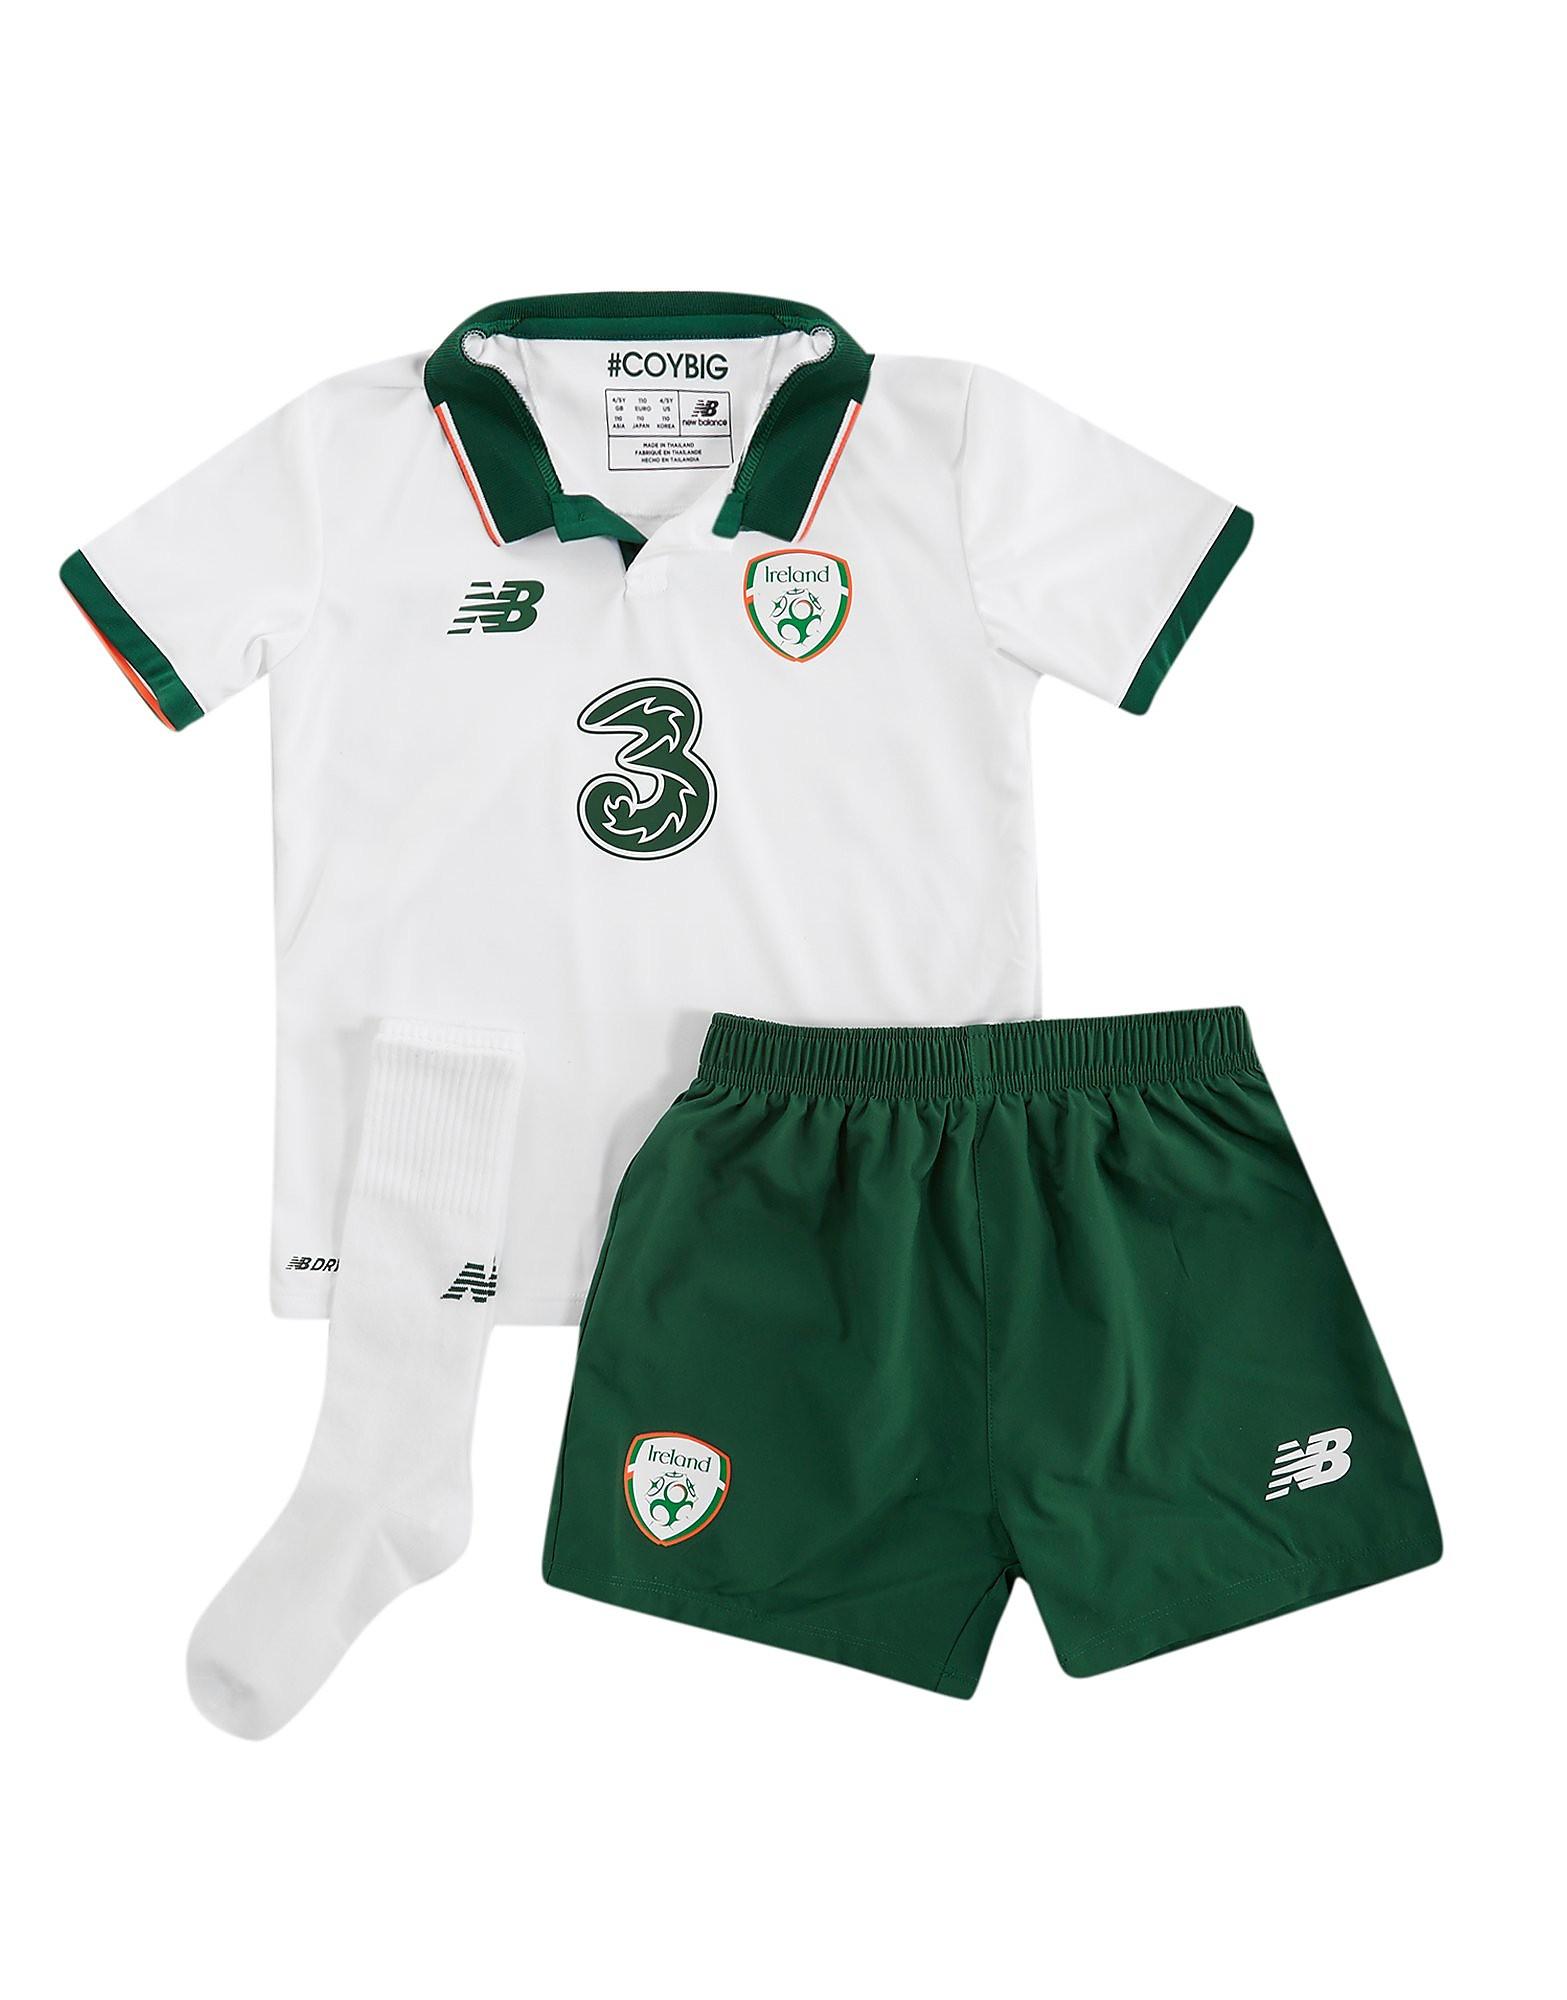 New Balance Republic of Ireland Away Kit Children